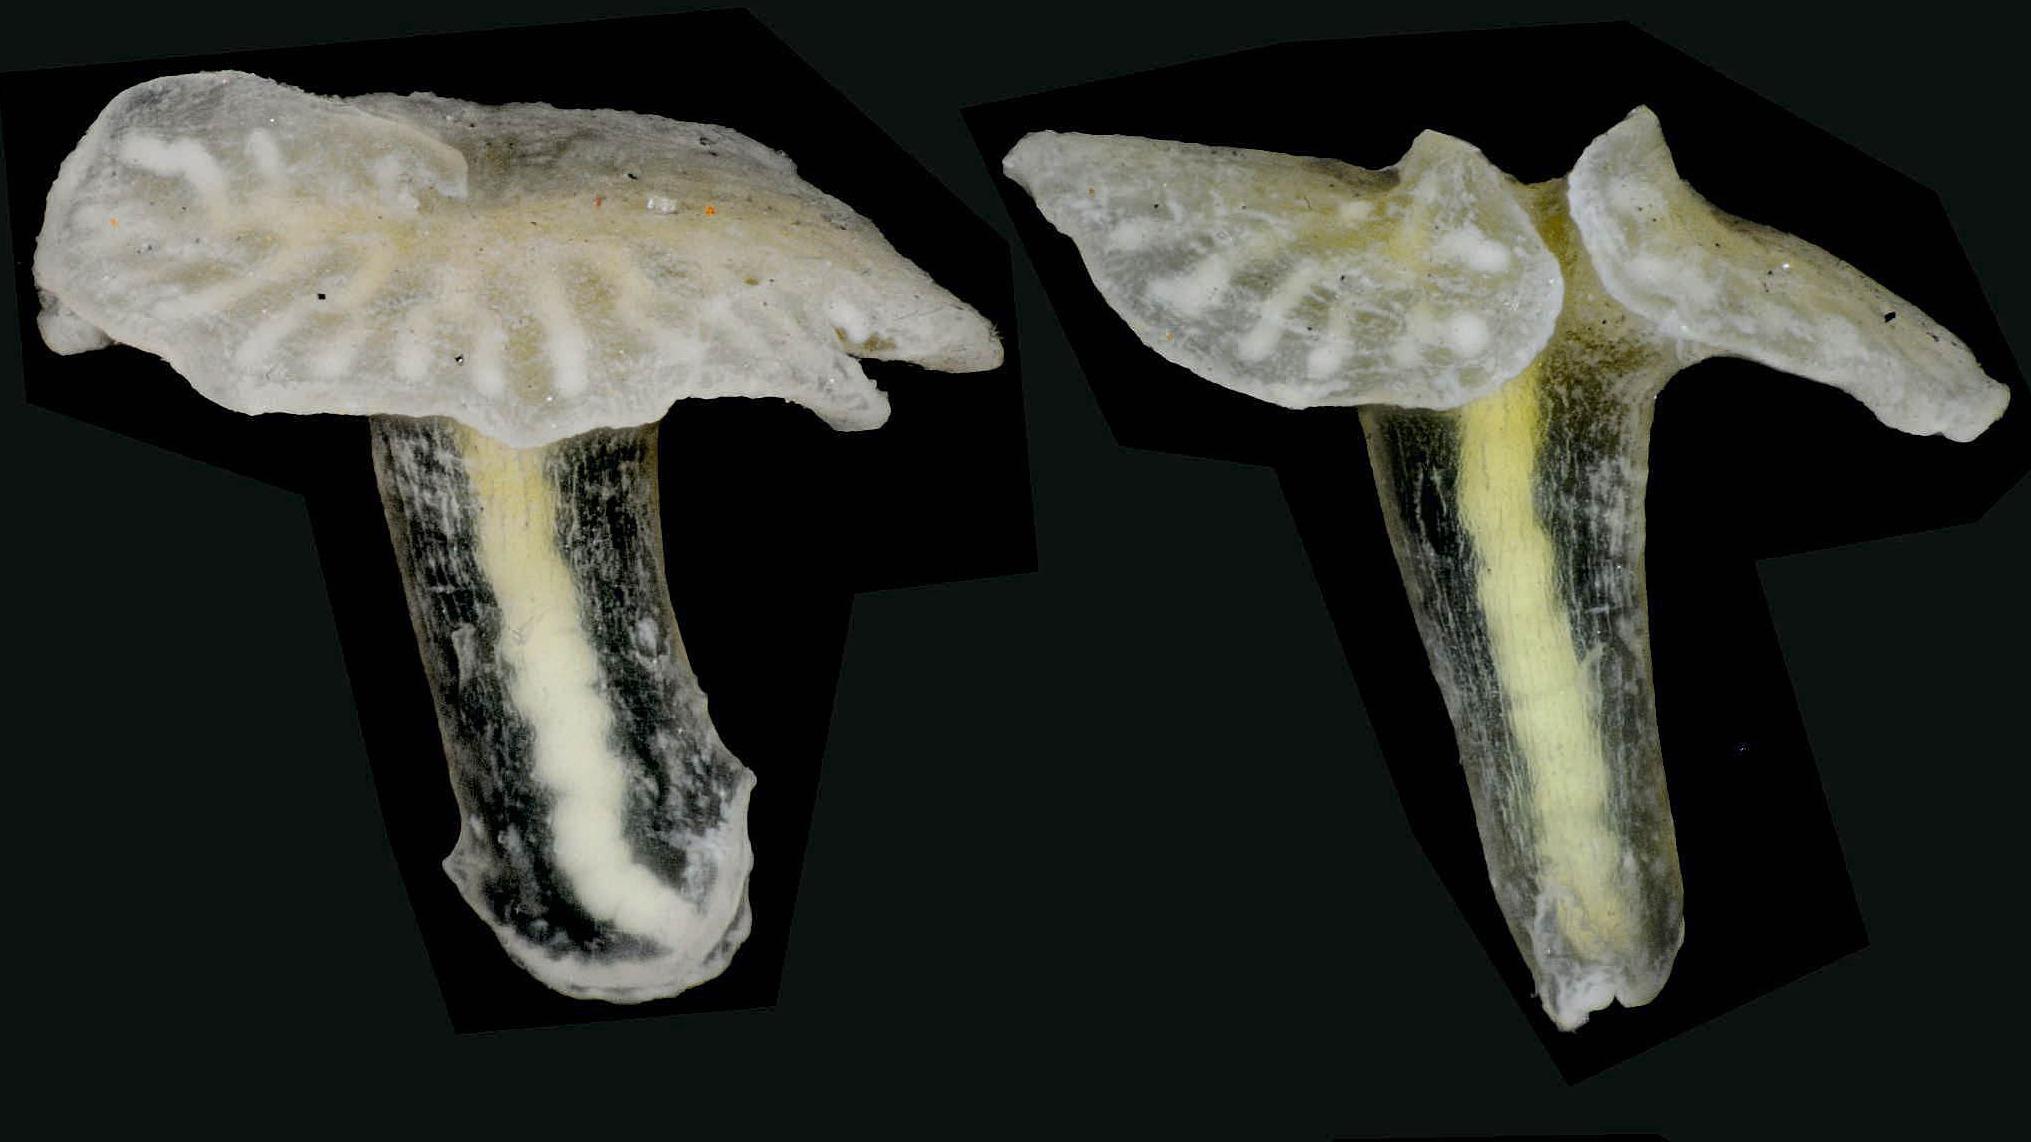 National Business Group On Health >> 'Alien mushroom creatures' found off Australian coast - ITV News